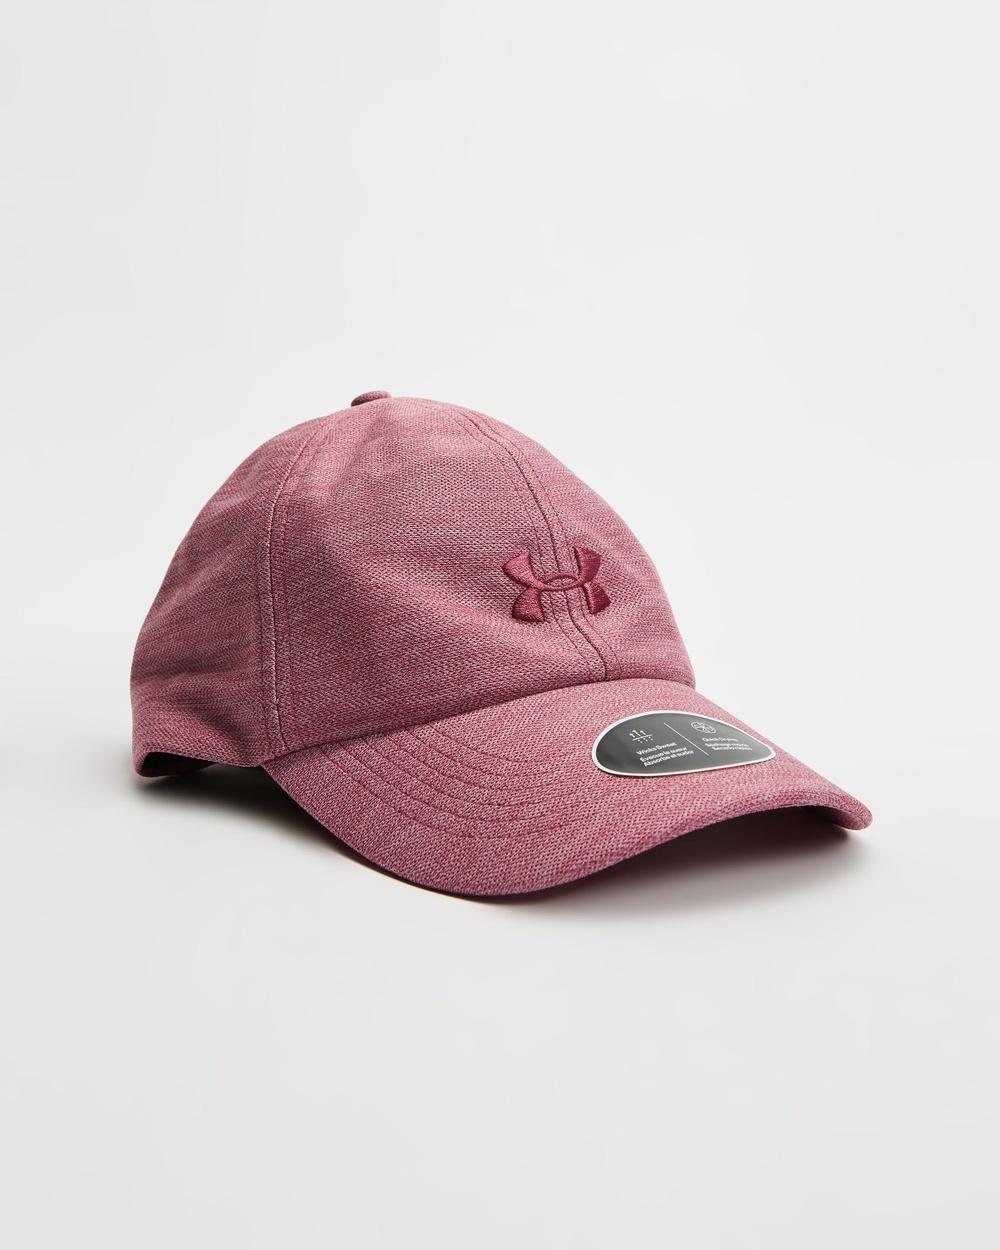 Under Armour Heathered Play Up Cap Headwear Pink Quartz